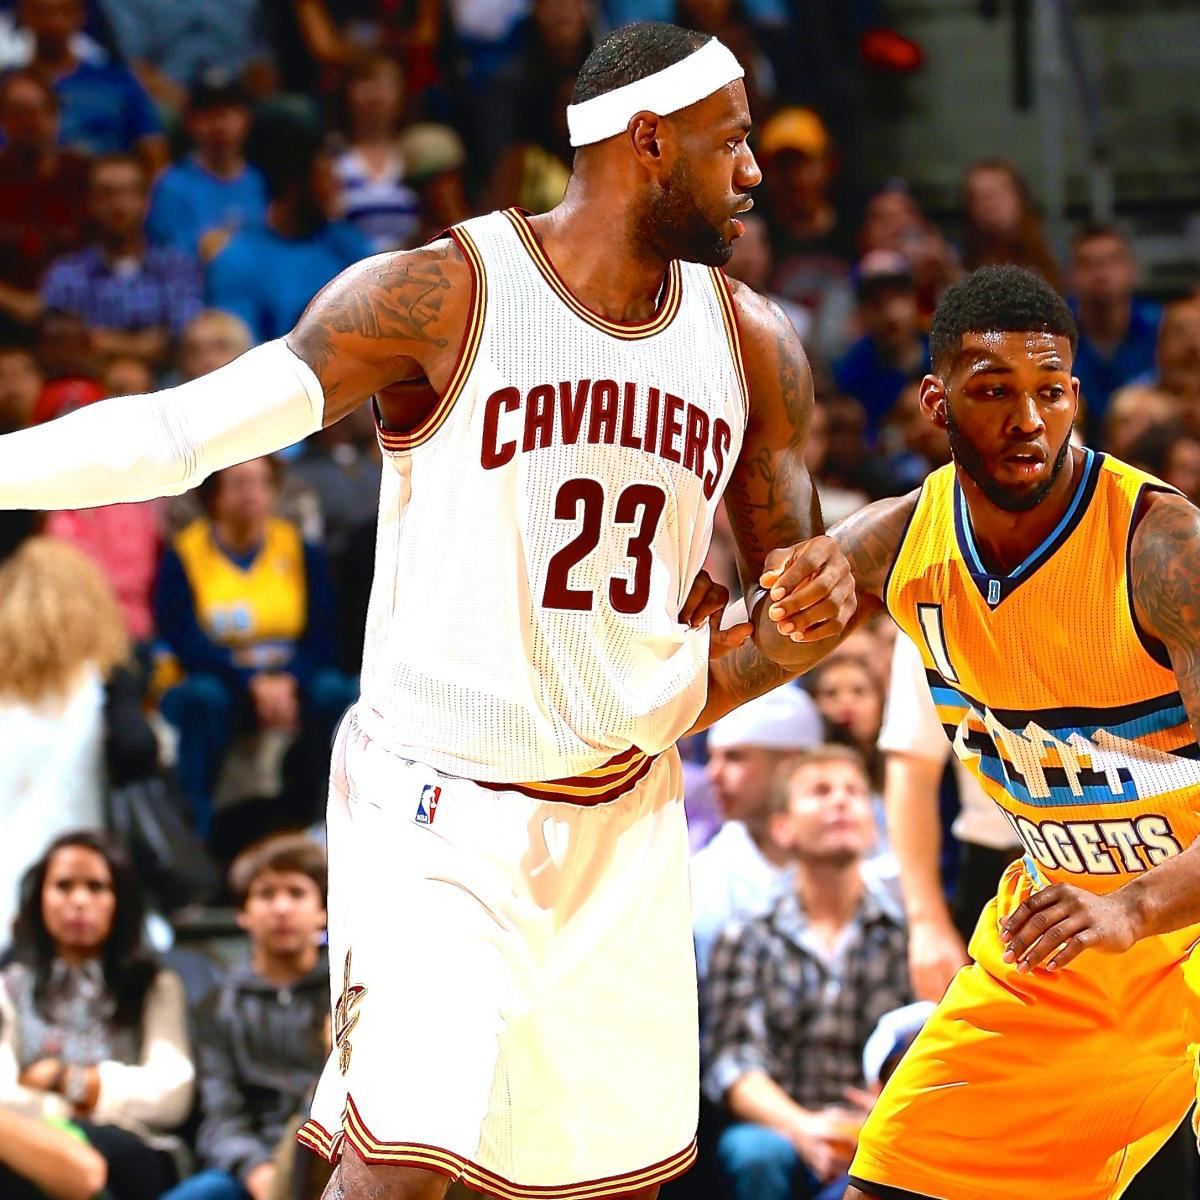 Nuggets Next Game: Denver Nuggets Vs. Cleveland Cavaliers: Live Score